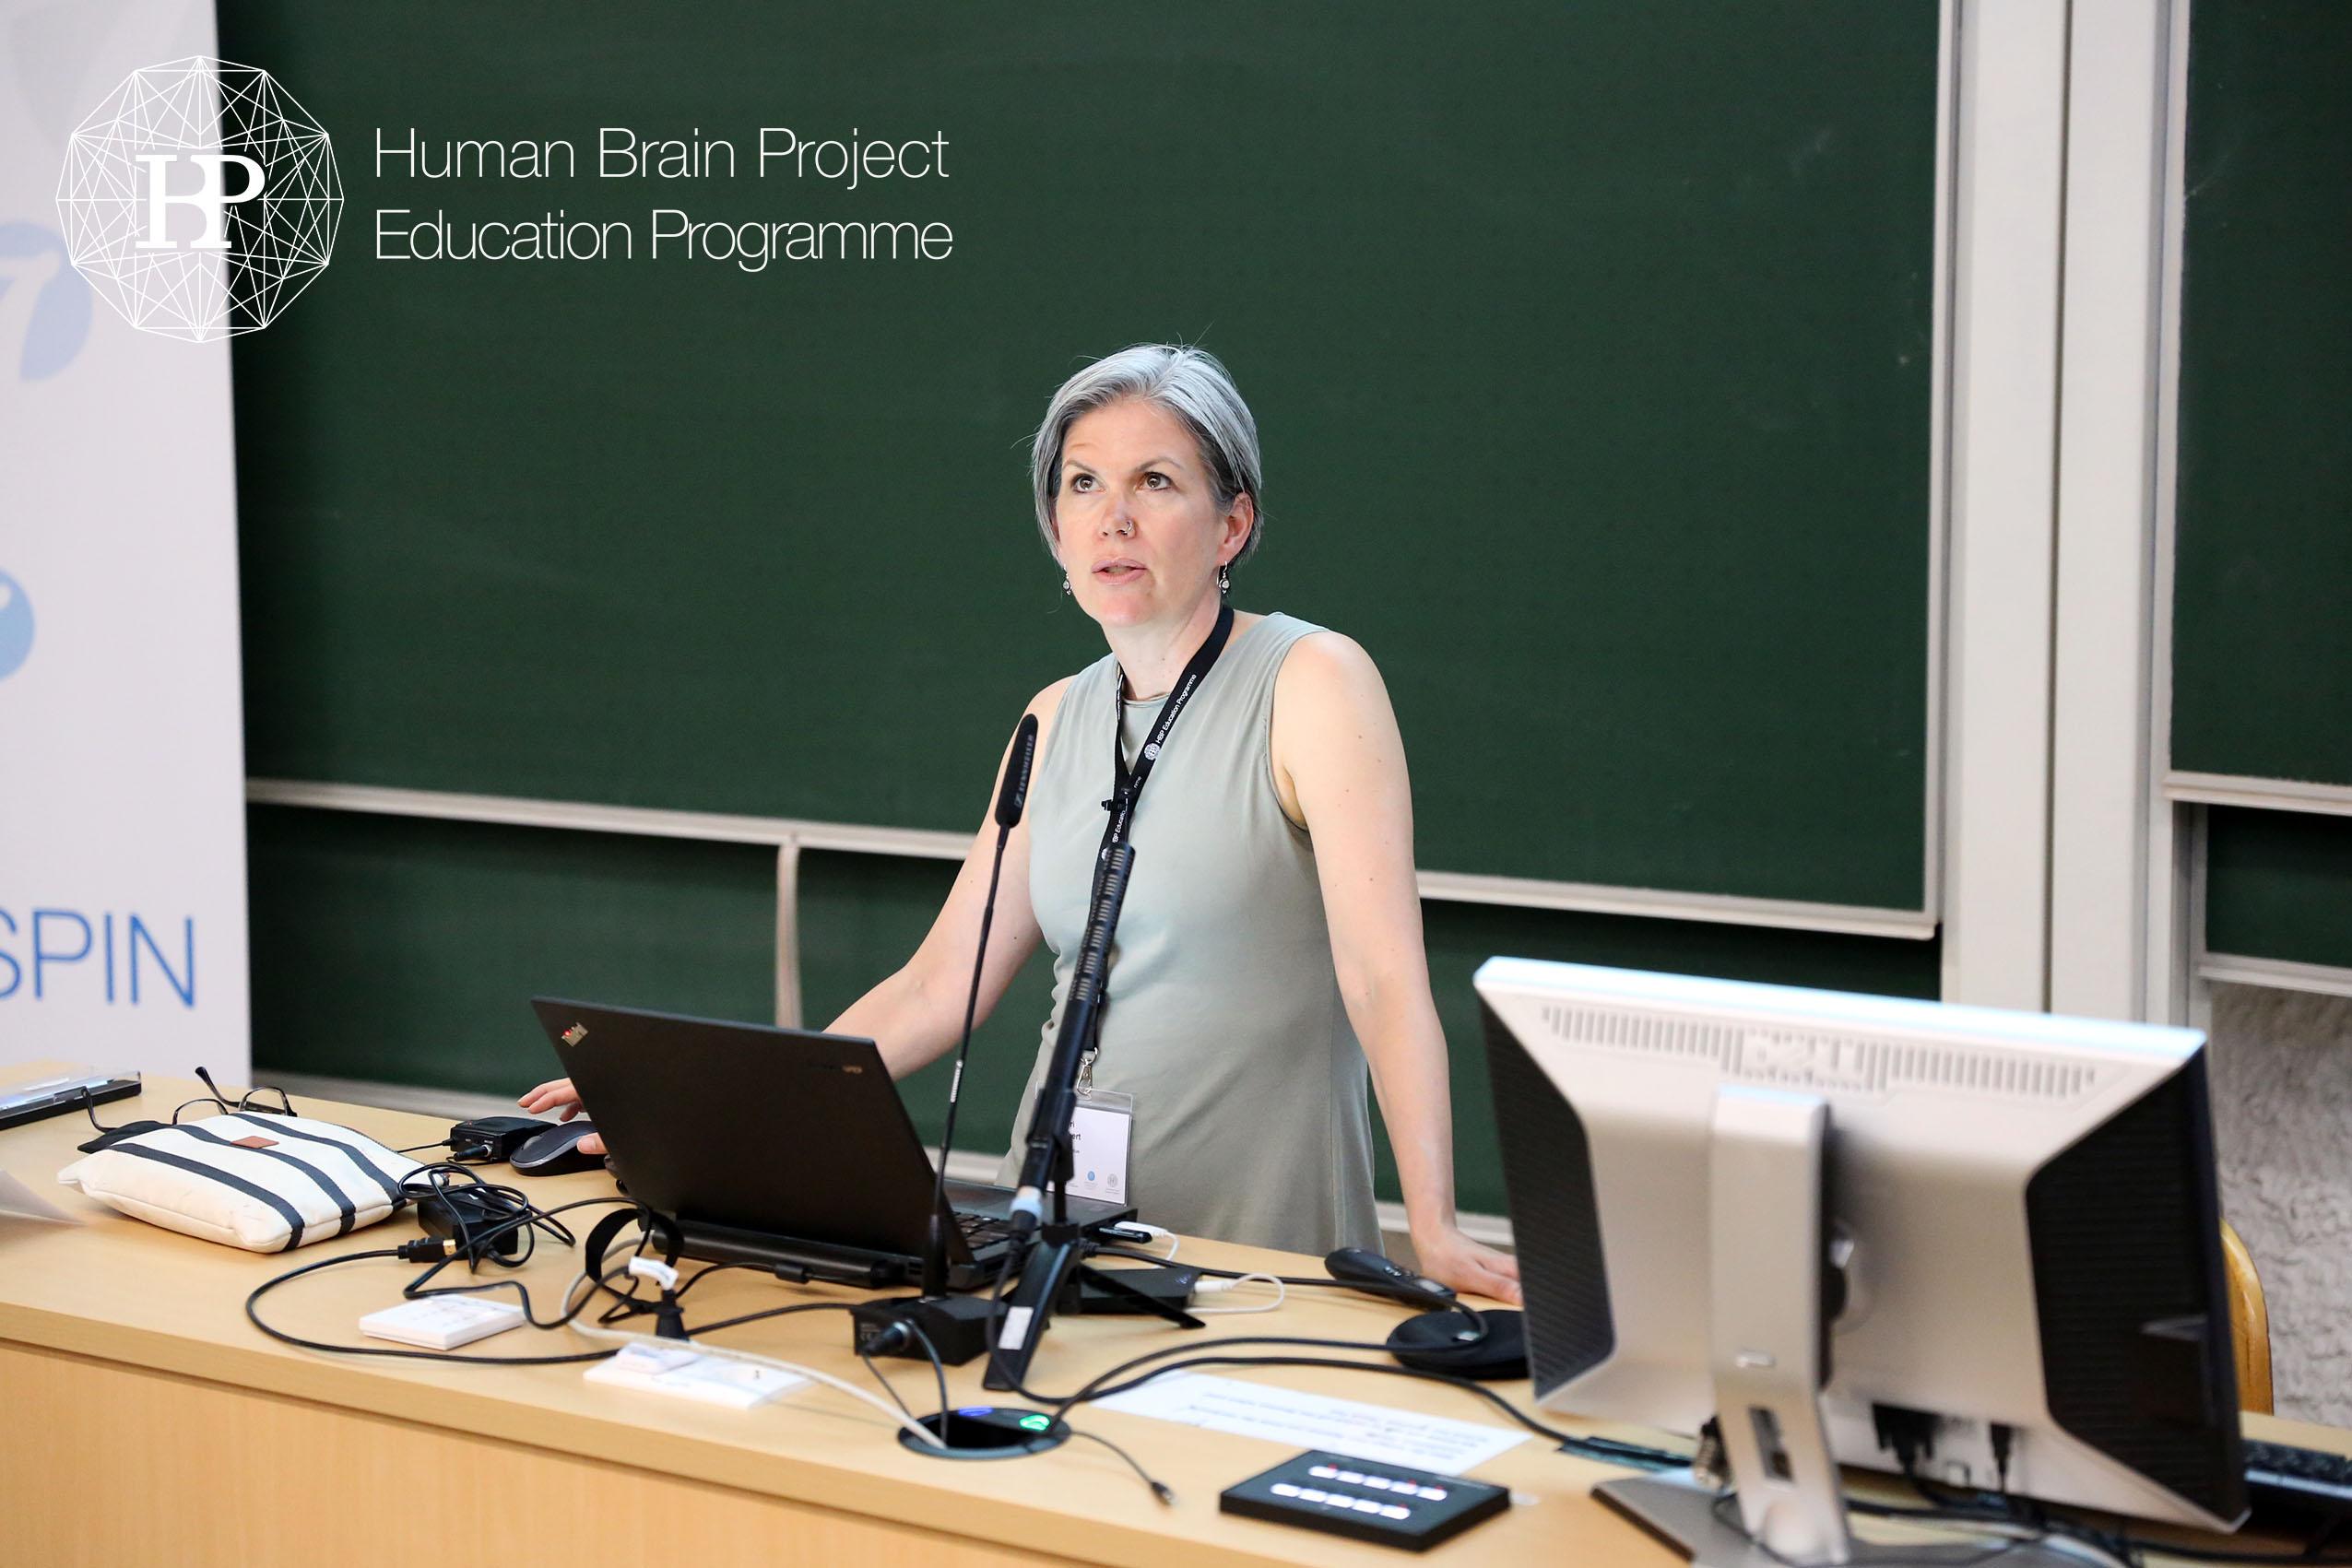 HBP_1st_Neurobiology_workshop_23.jpg -